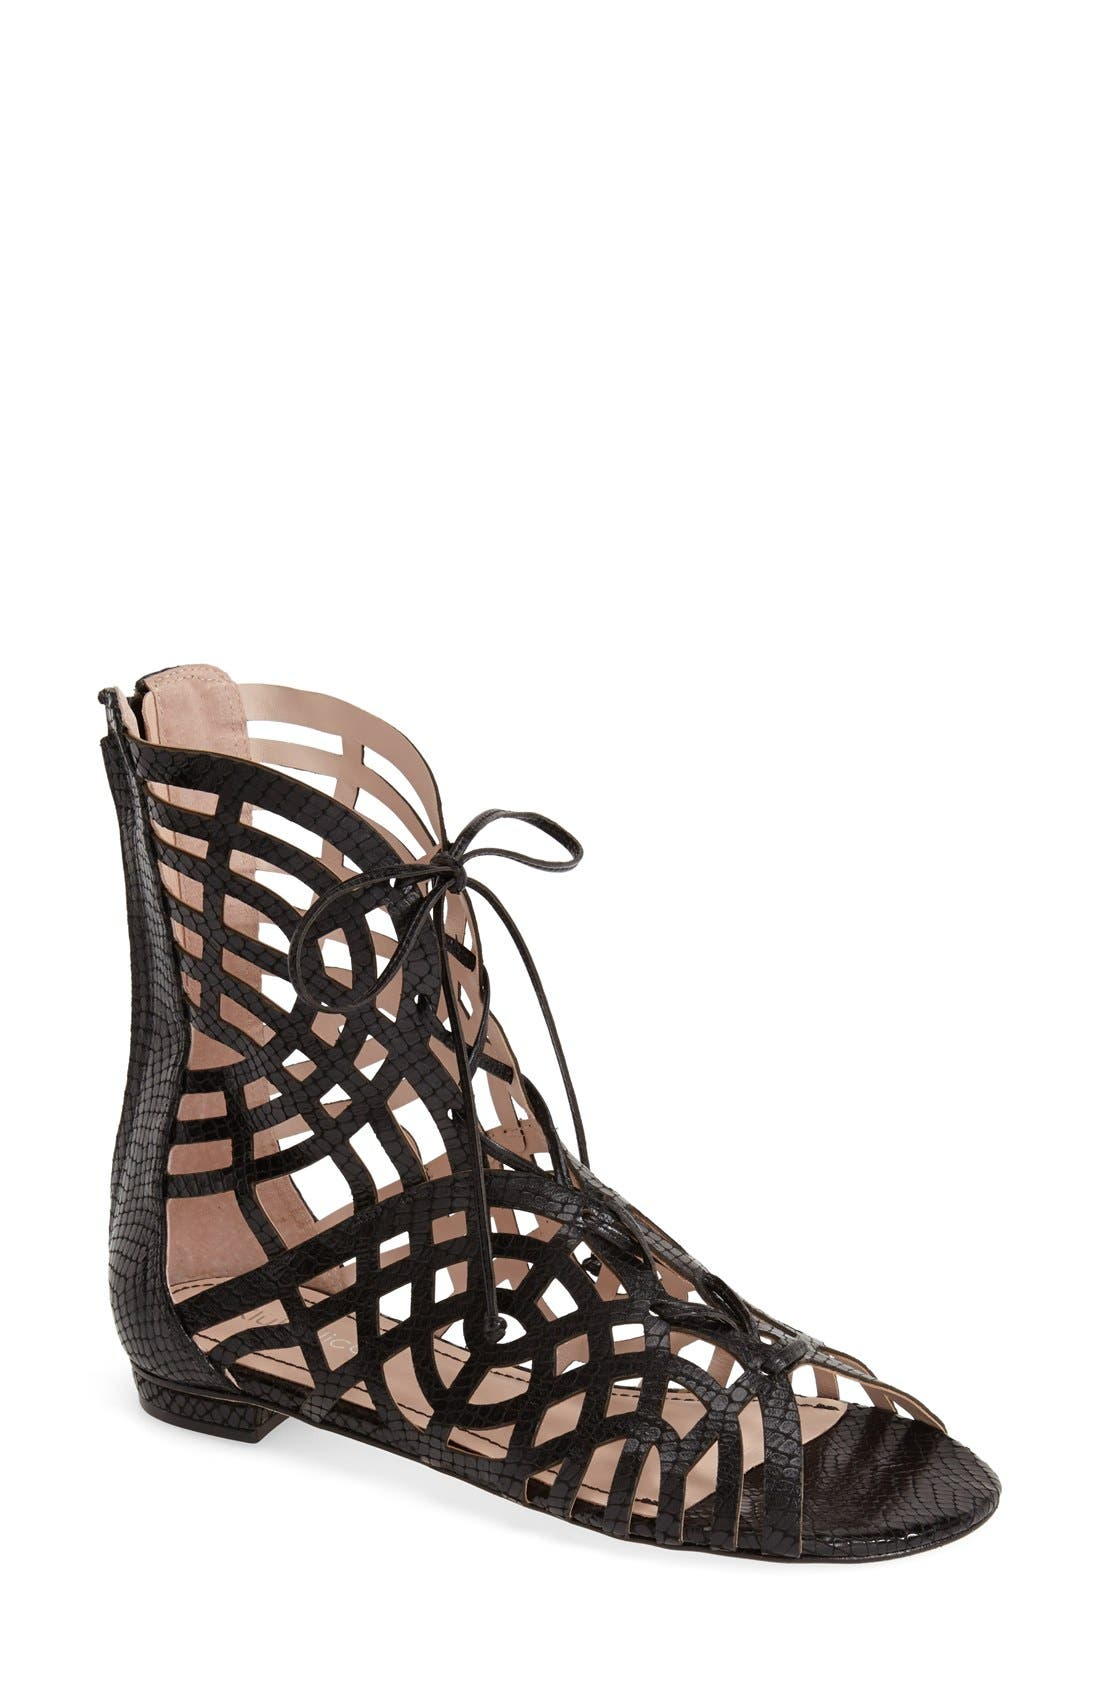 Alternate Image 1 Selected - Klub Nico 'Jocelyn' Cutout Gladiator Sandal (Women)